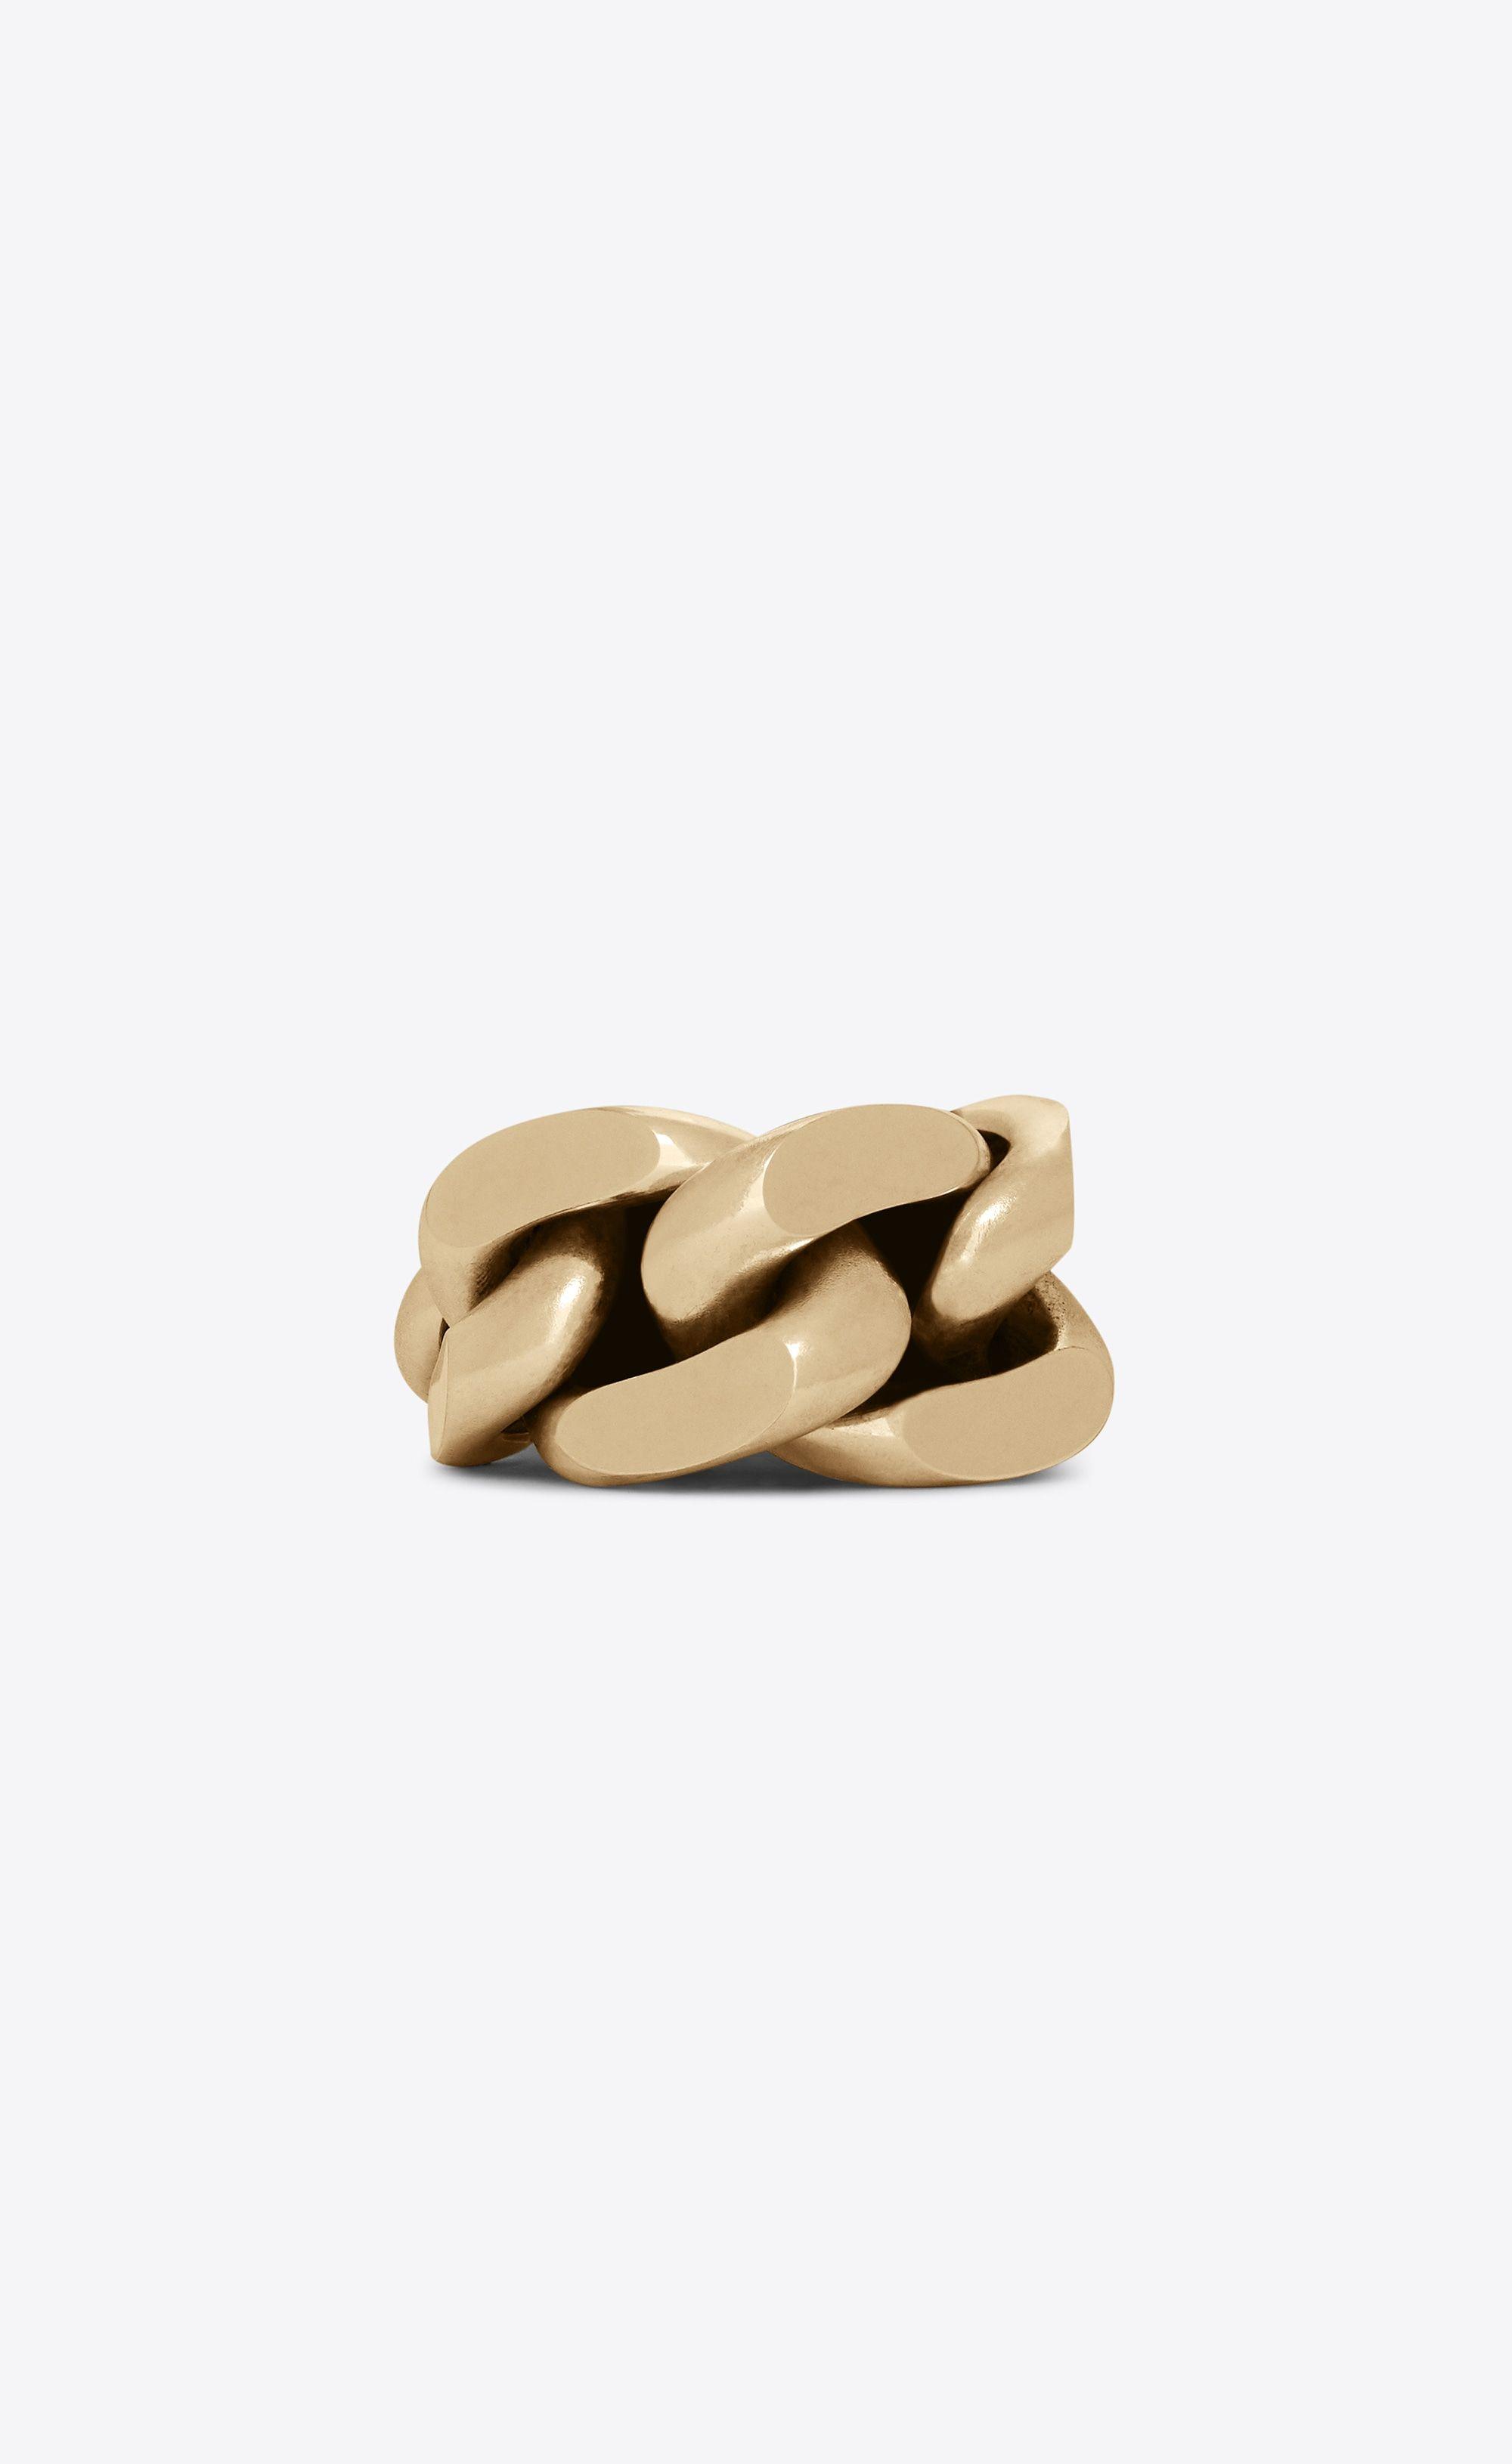 c54bfae6ef9  Saint Laurent - Chaines link bracelet in light gold-tone metal ($1,595)